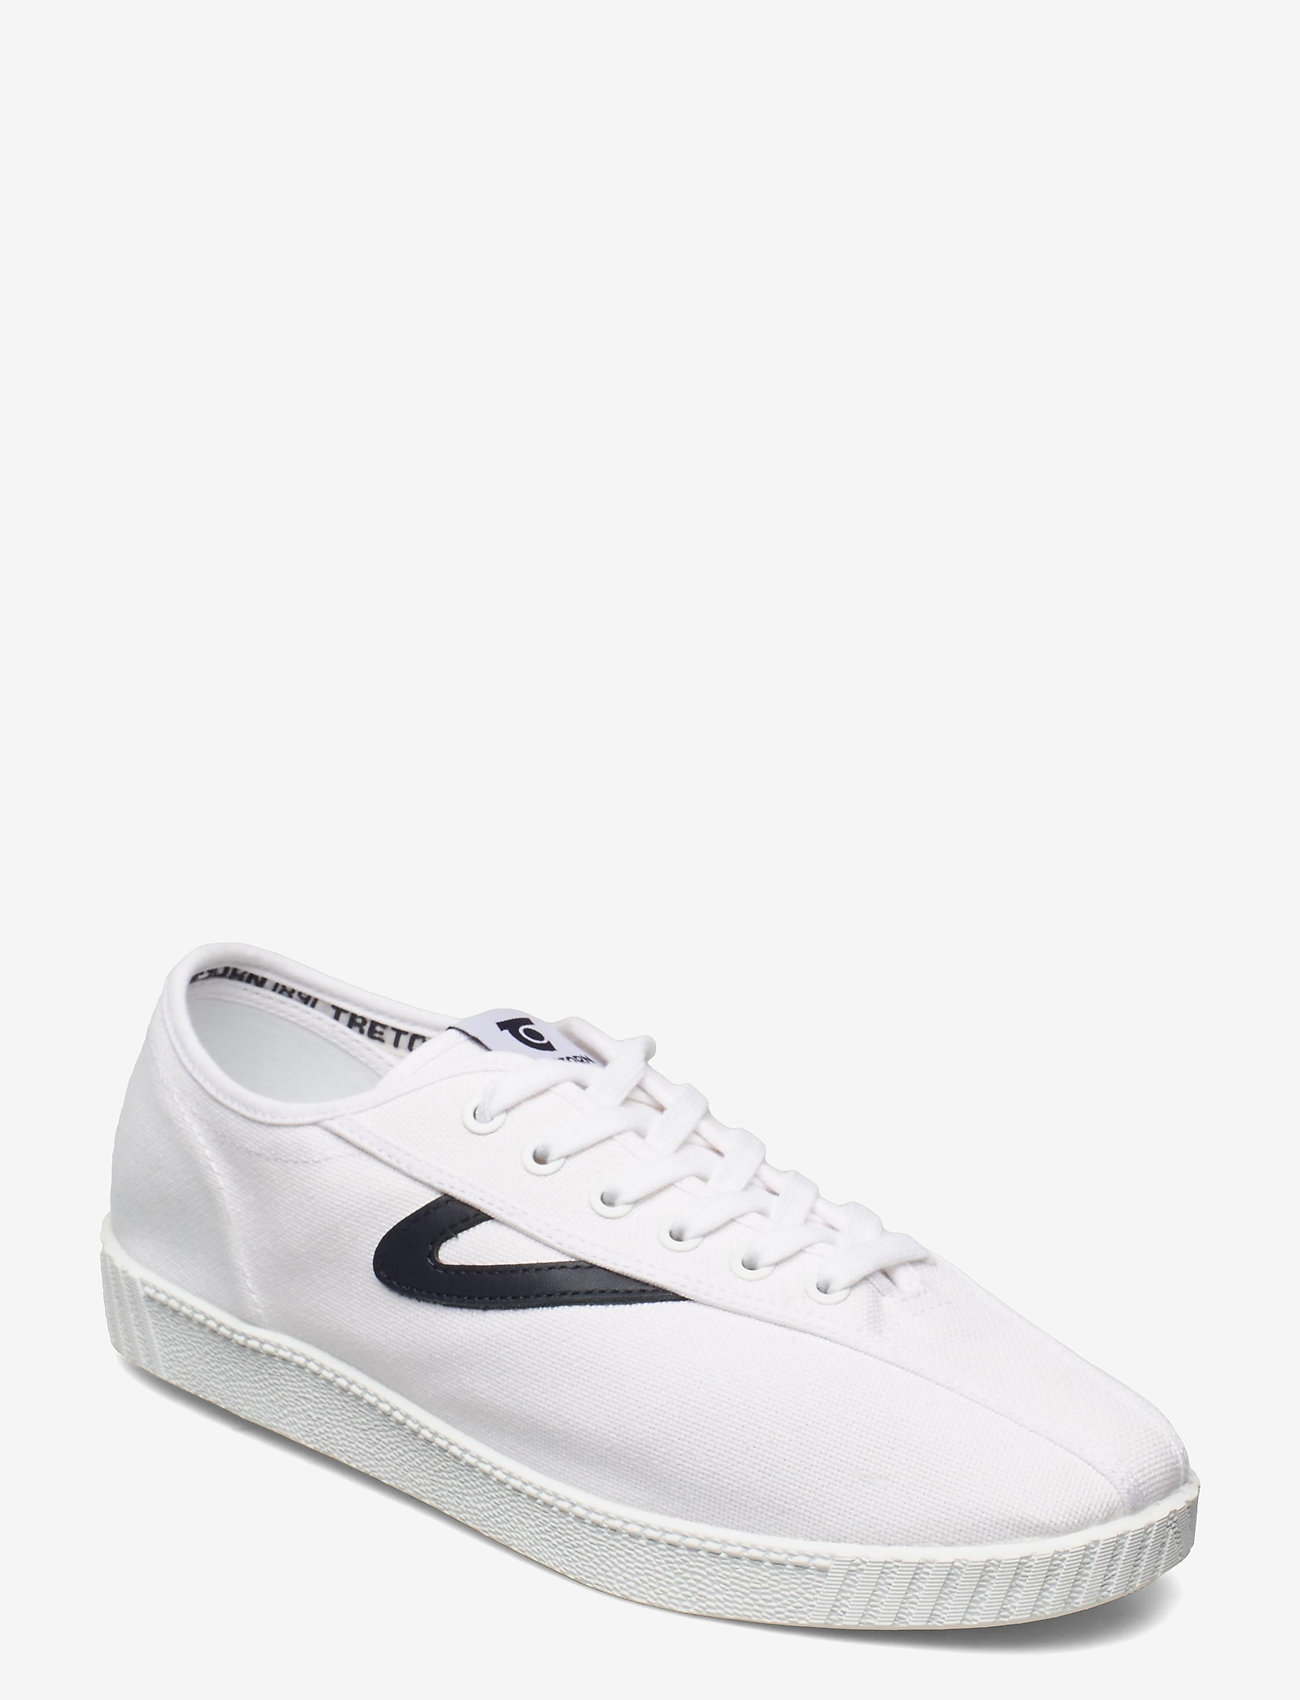 Tretorn - NYLITE - låga sneakers - 031/white/lnavy - 0